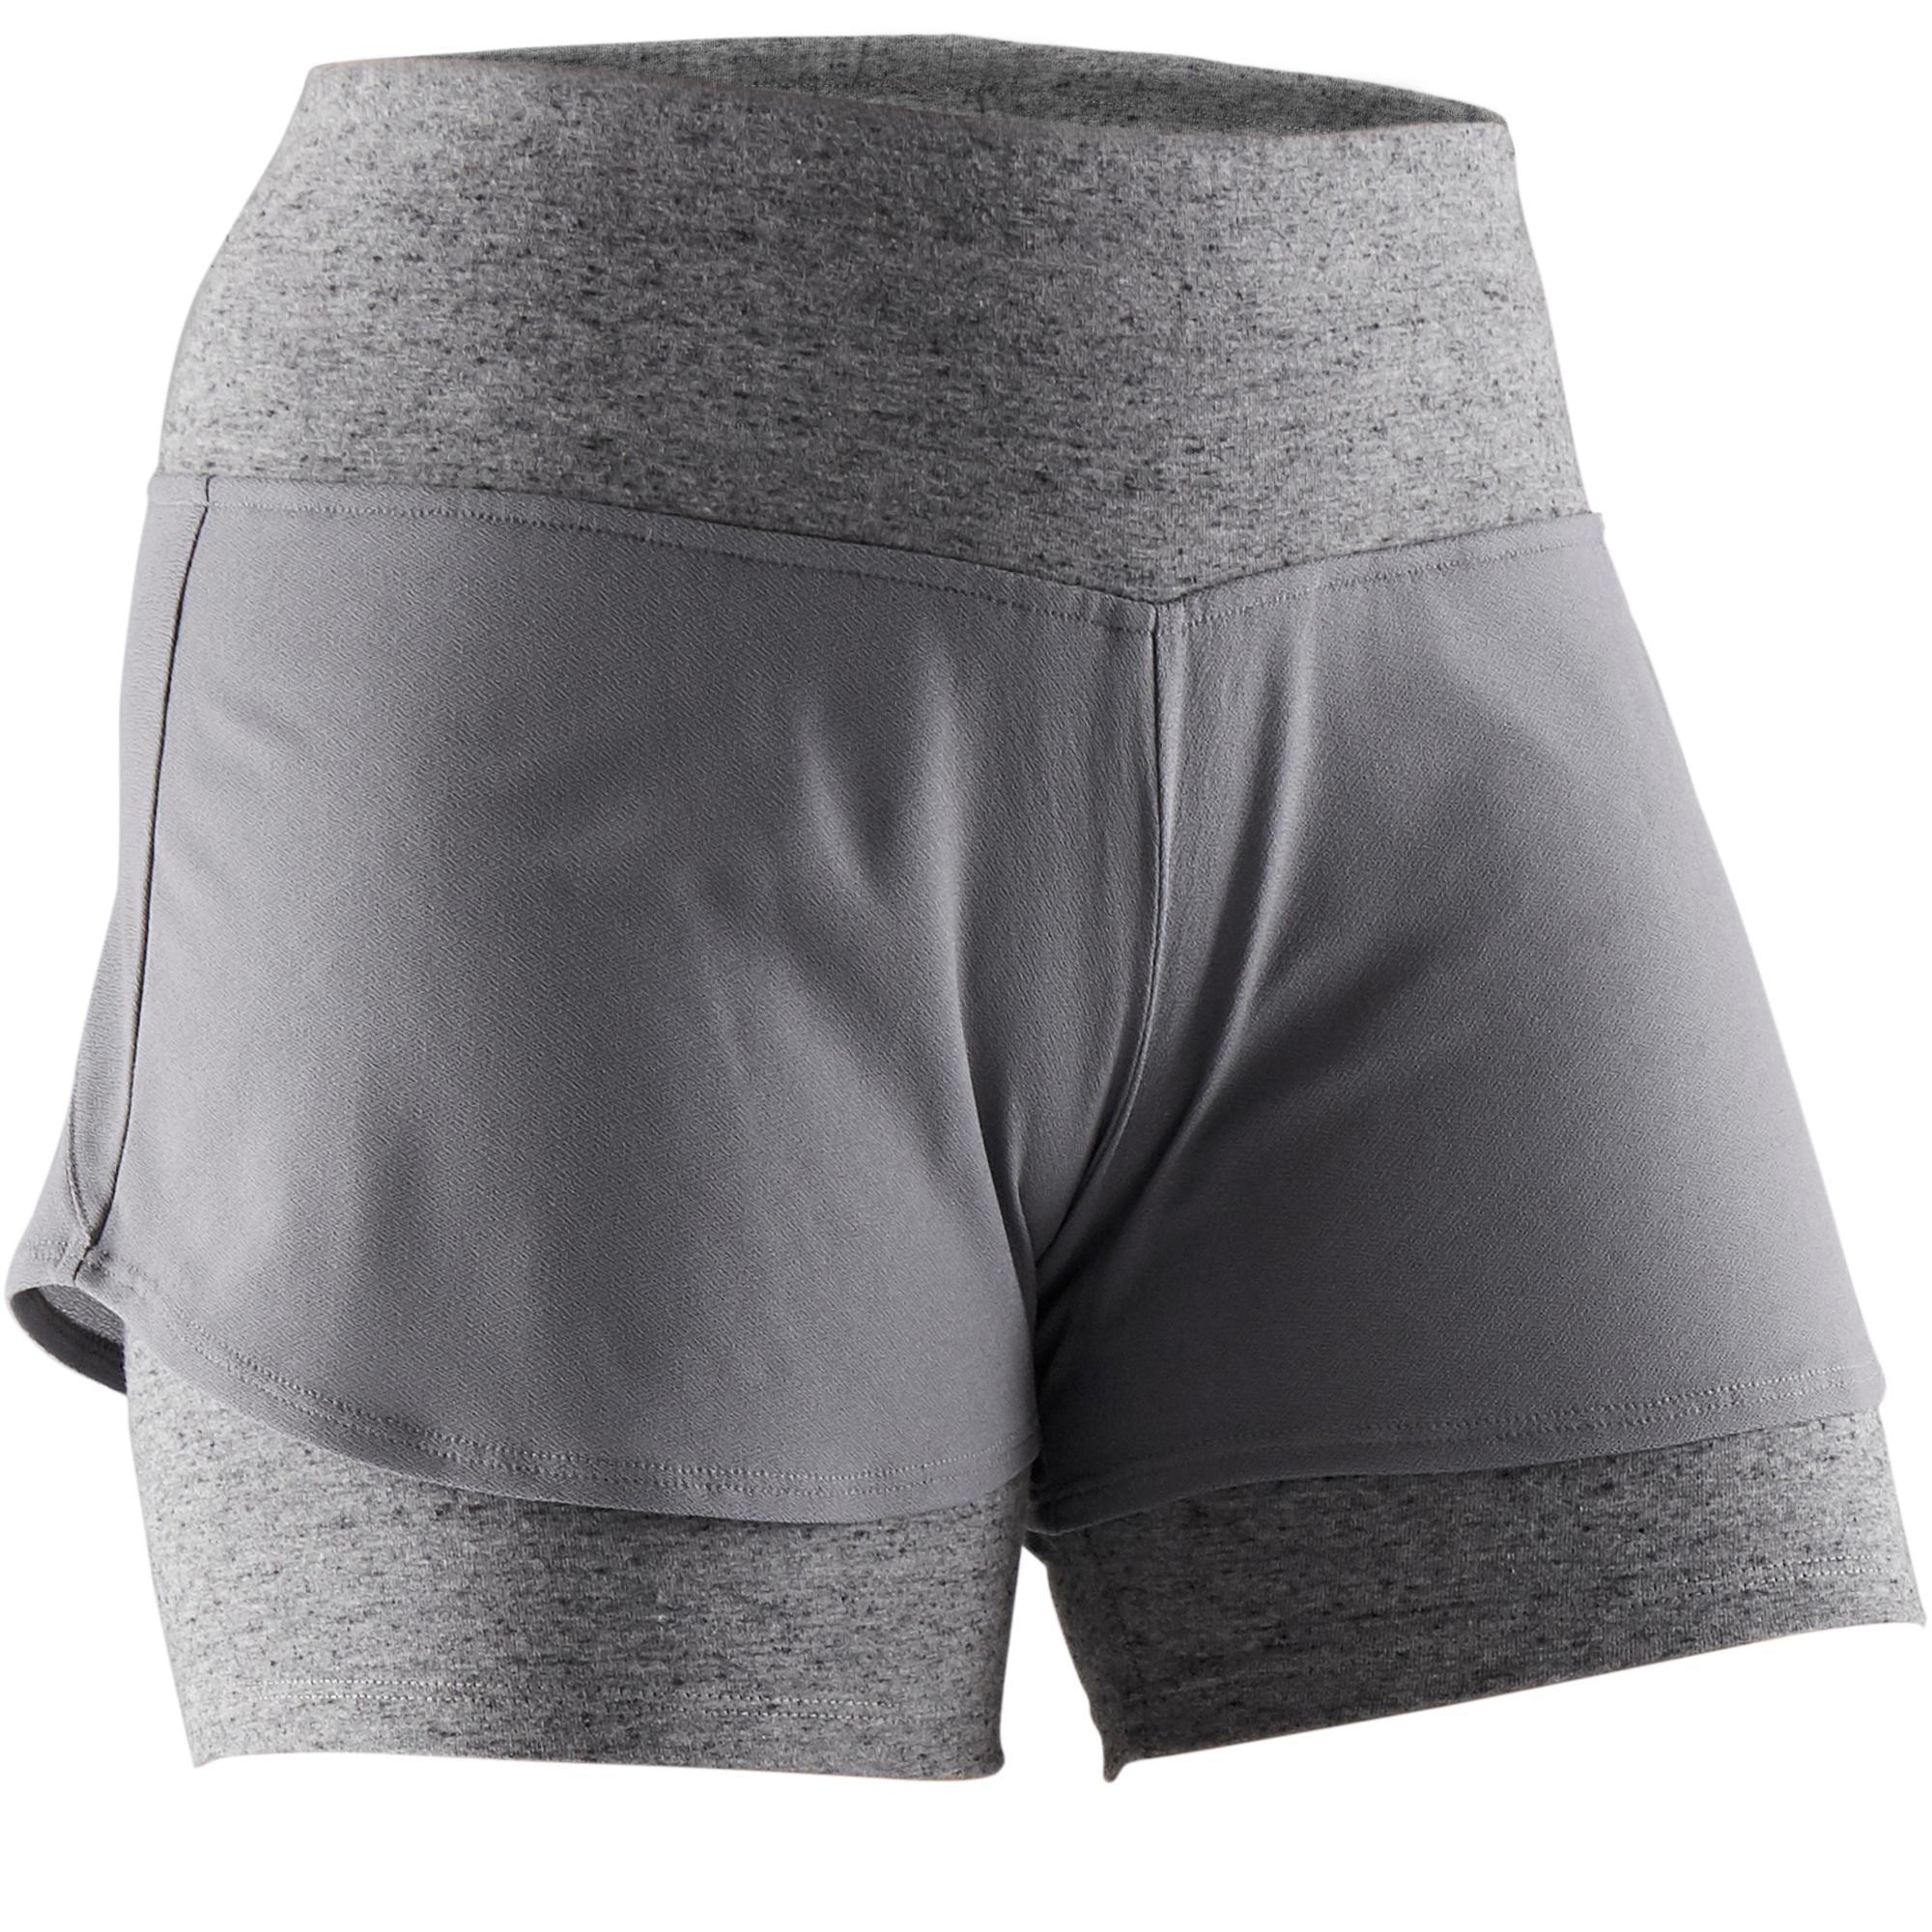 Sporthose kurz 520 Pilates sanfte Gym Damen grau | Sportbekleidung > Sporthosen > Sonstige Sporthosen | Grau | Domyos